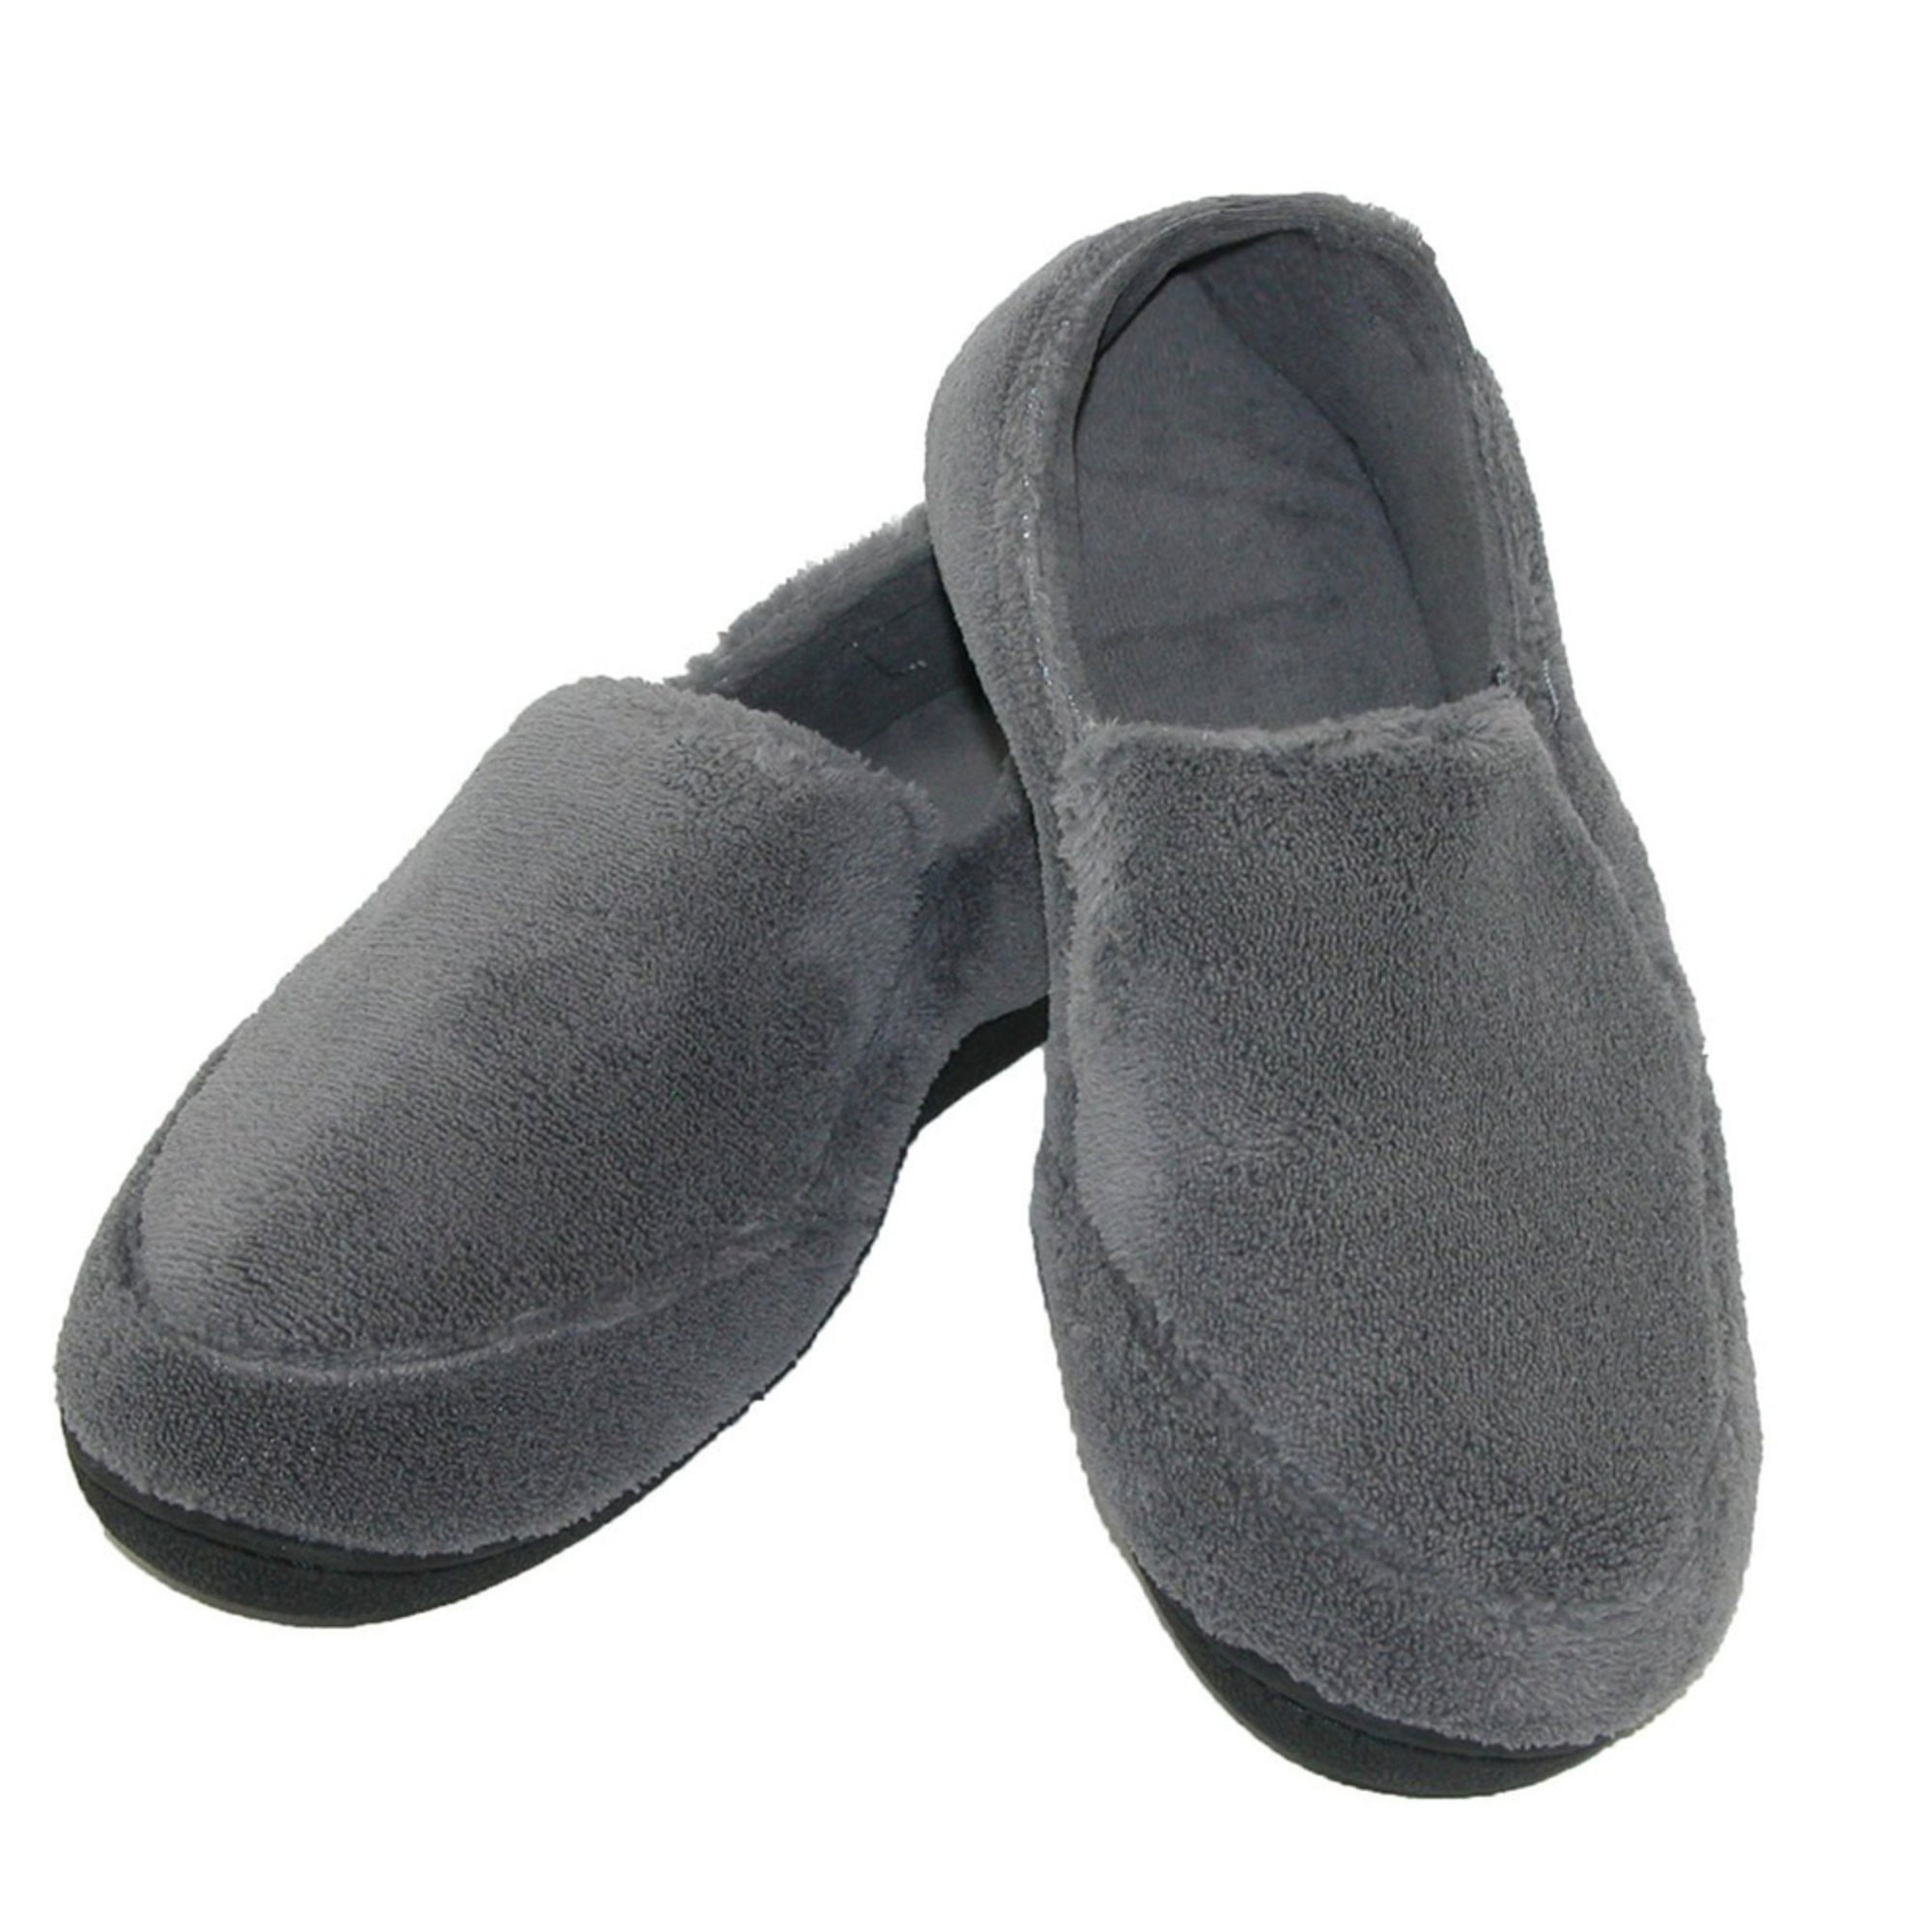 Bedroom Slippers Mens